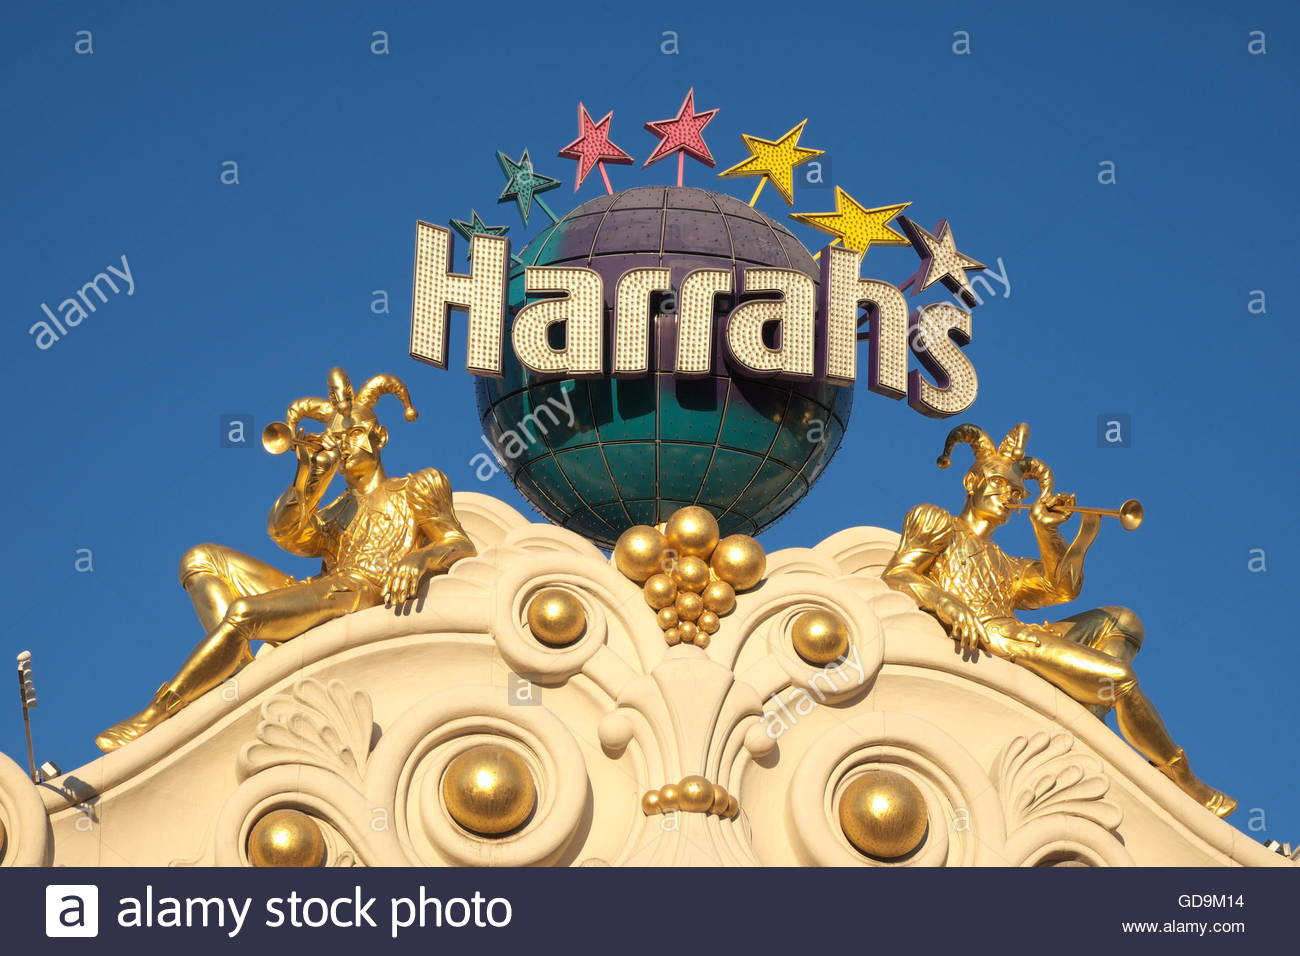 Harrahs casino stock symbol atlantic city resorts casino